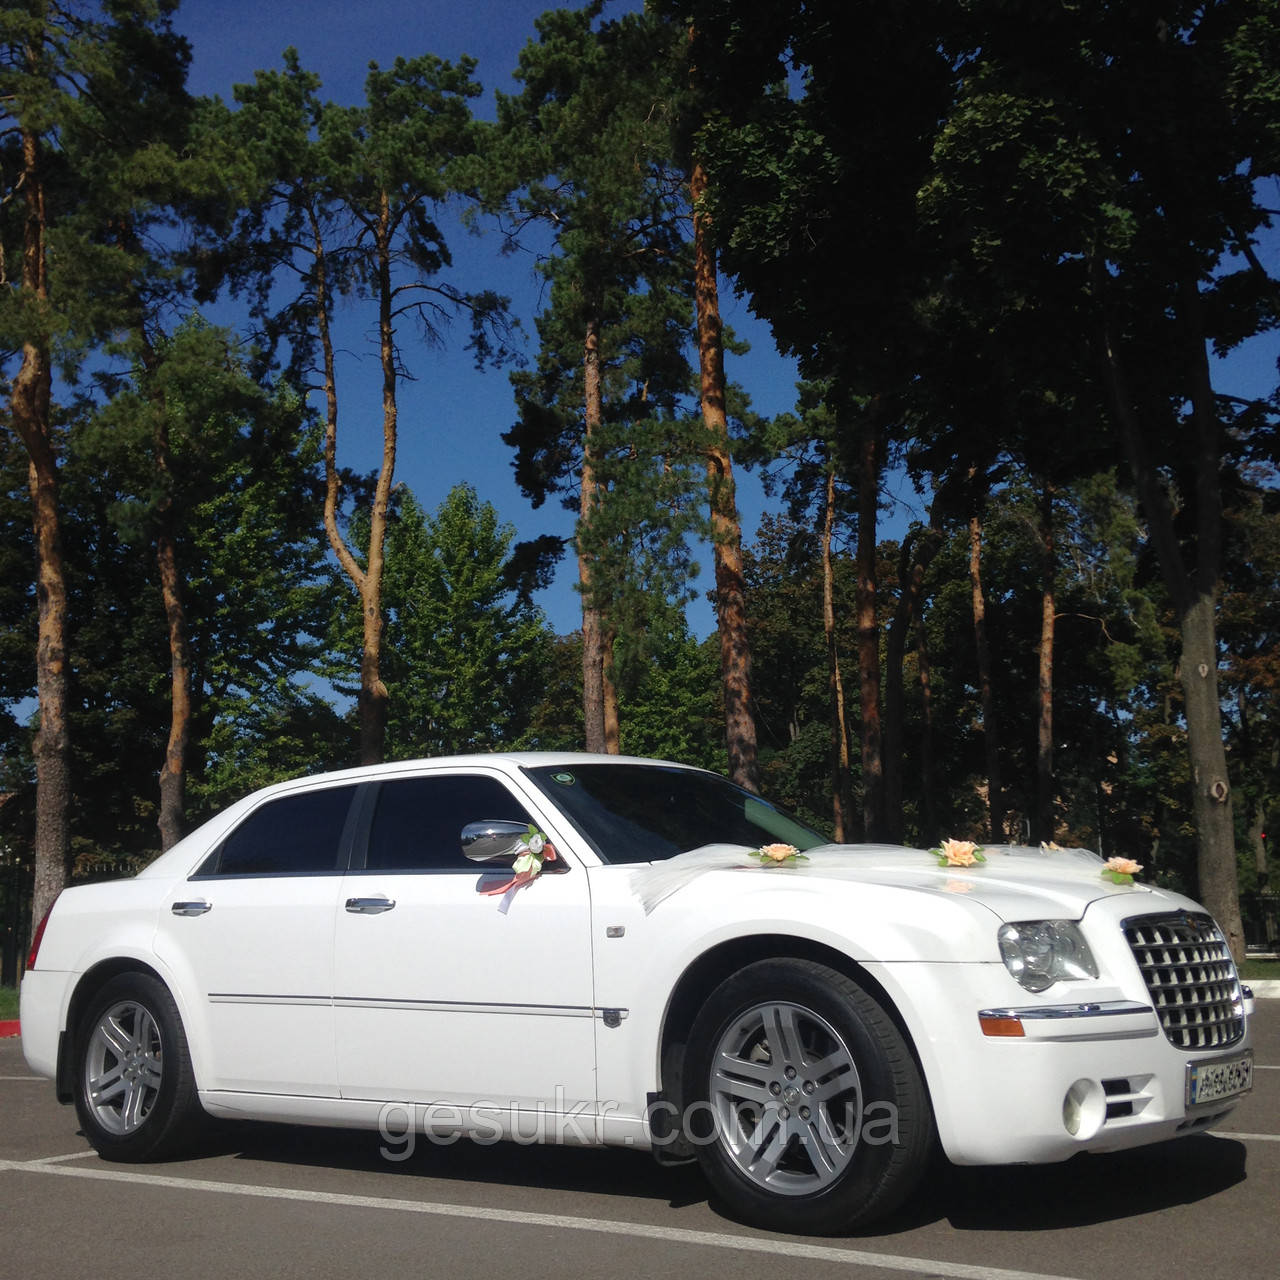 Аренда авто на свадьбу Белый Chrysler 300c